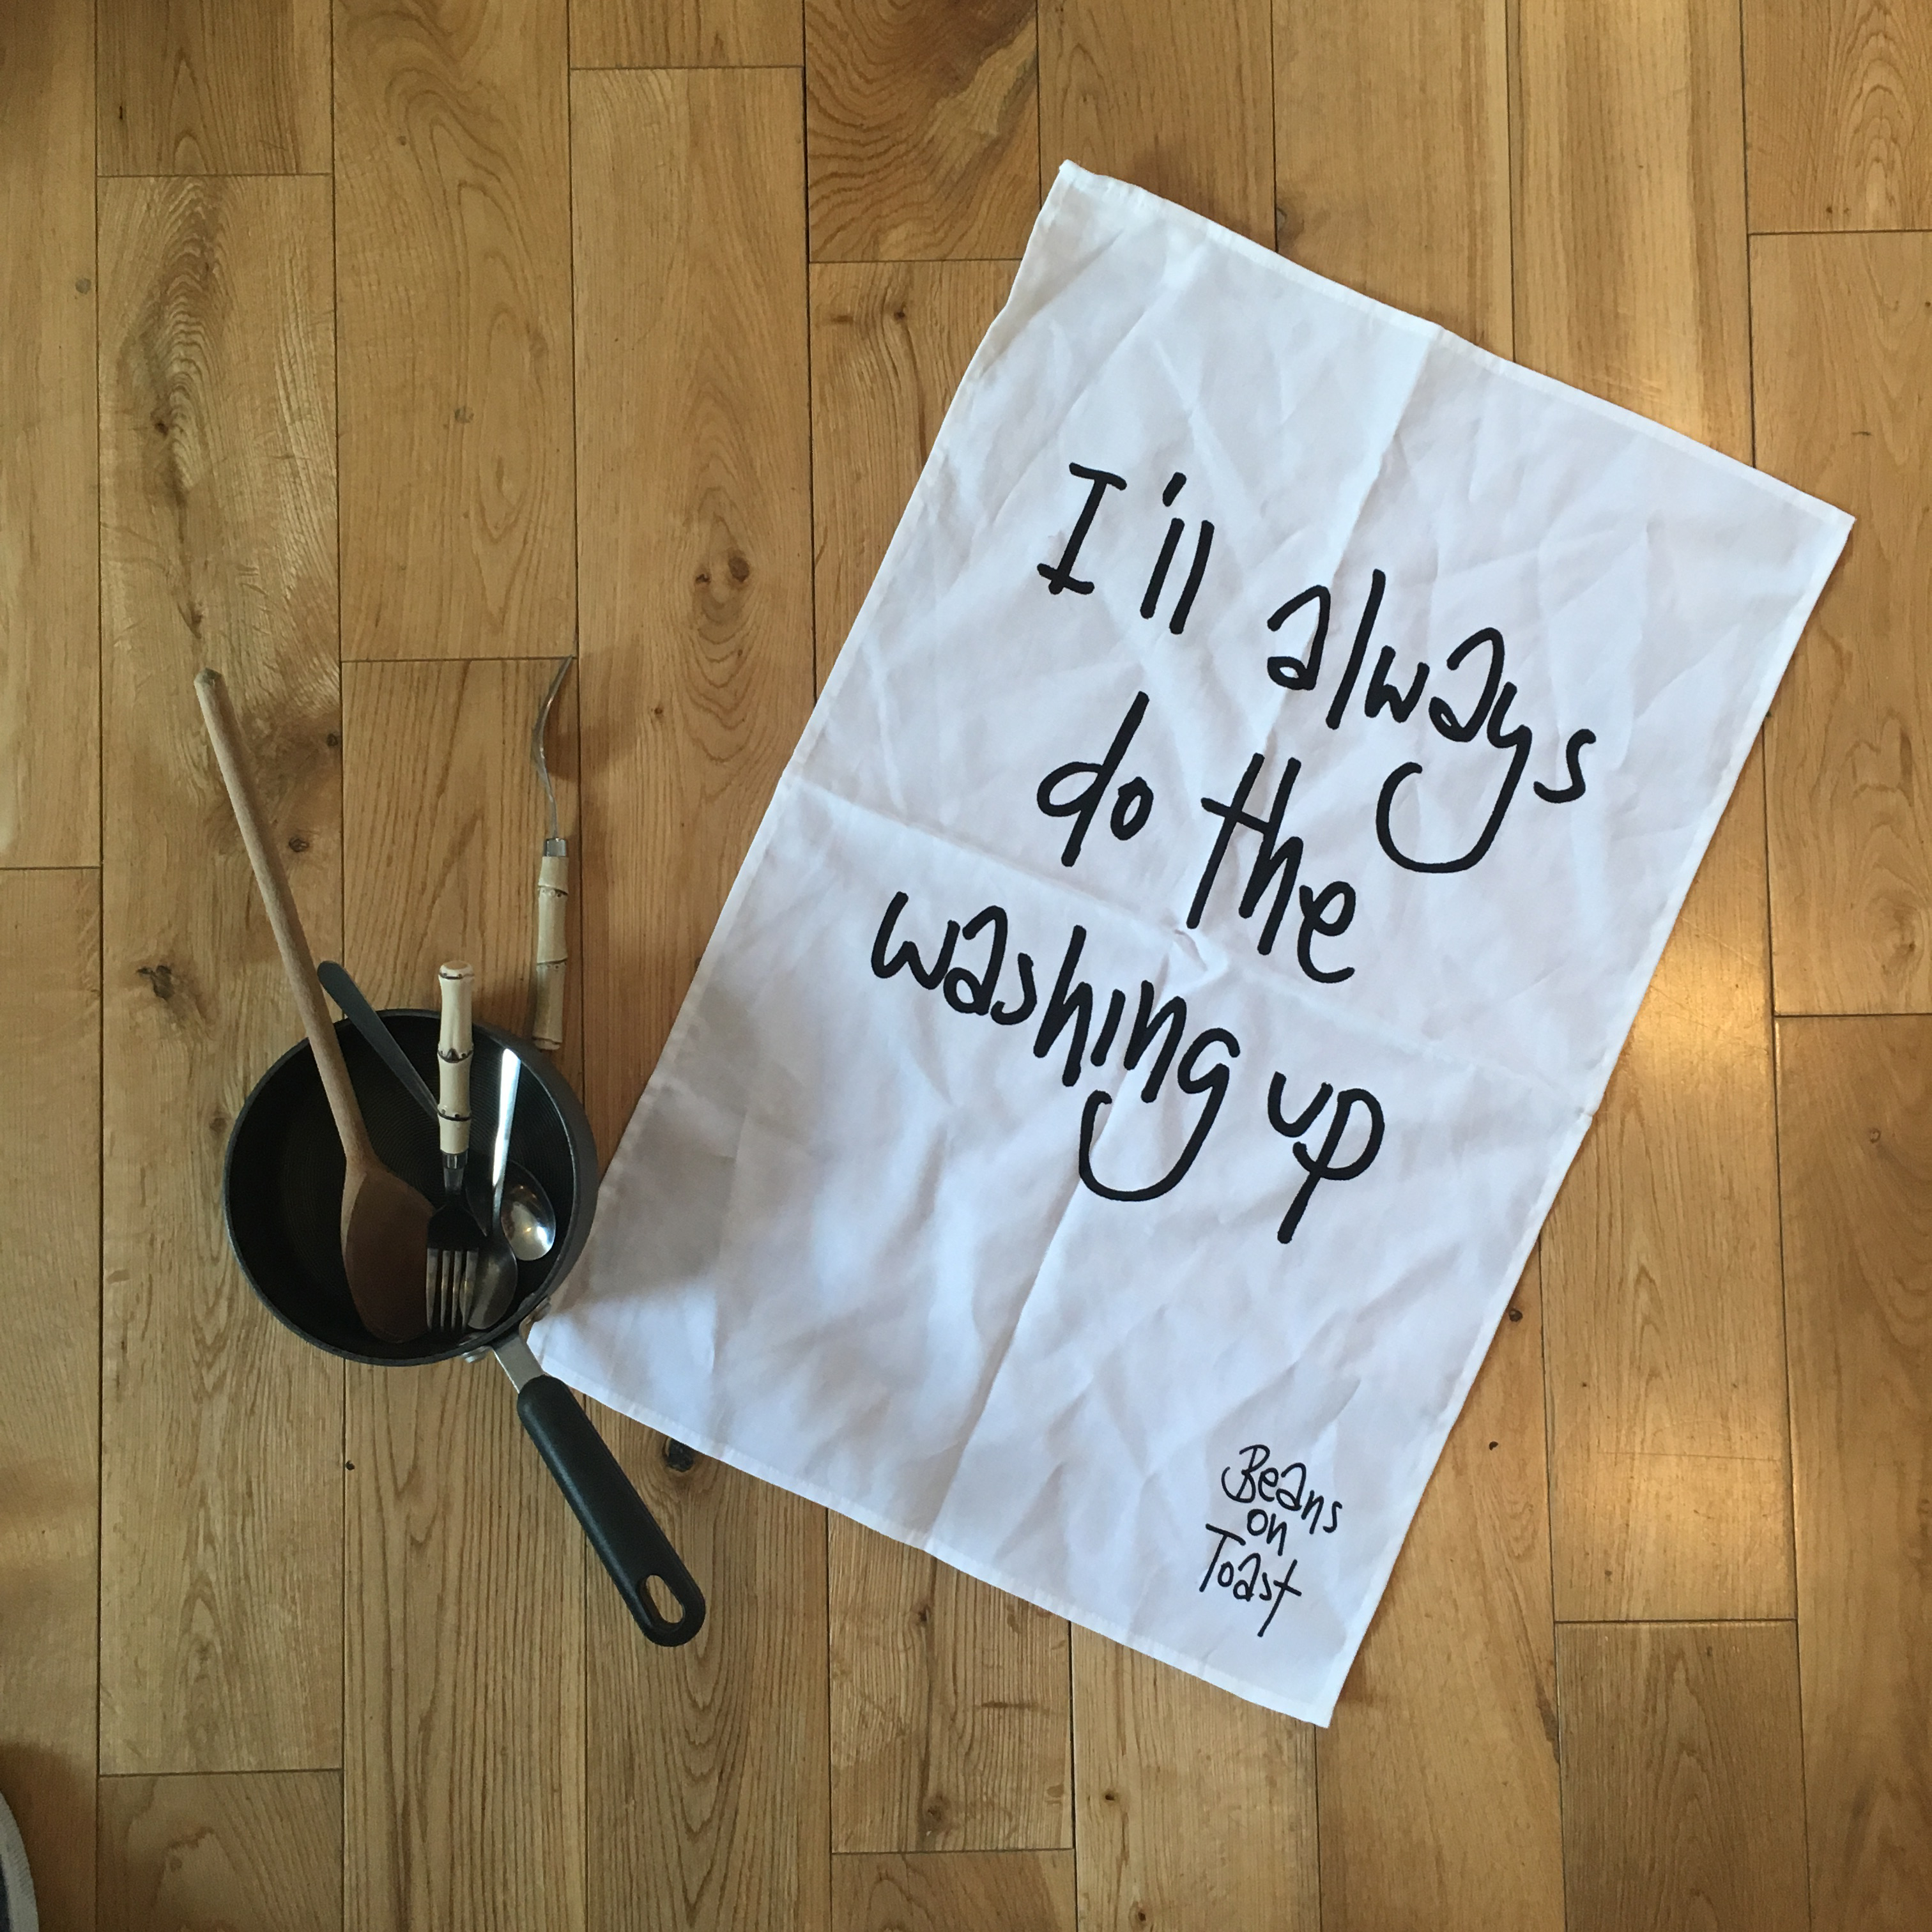 Beans on Toast - I'LL ALWAYS DO THE WASHING UP - Tea Towel